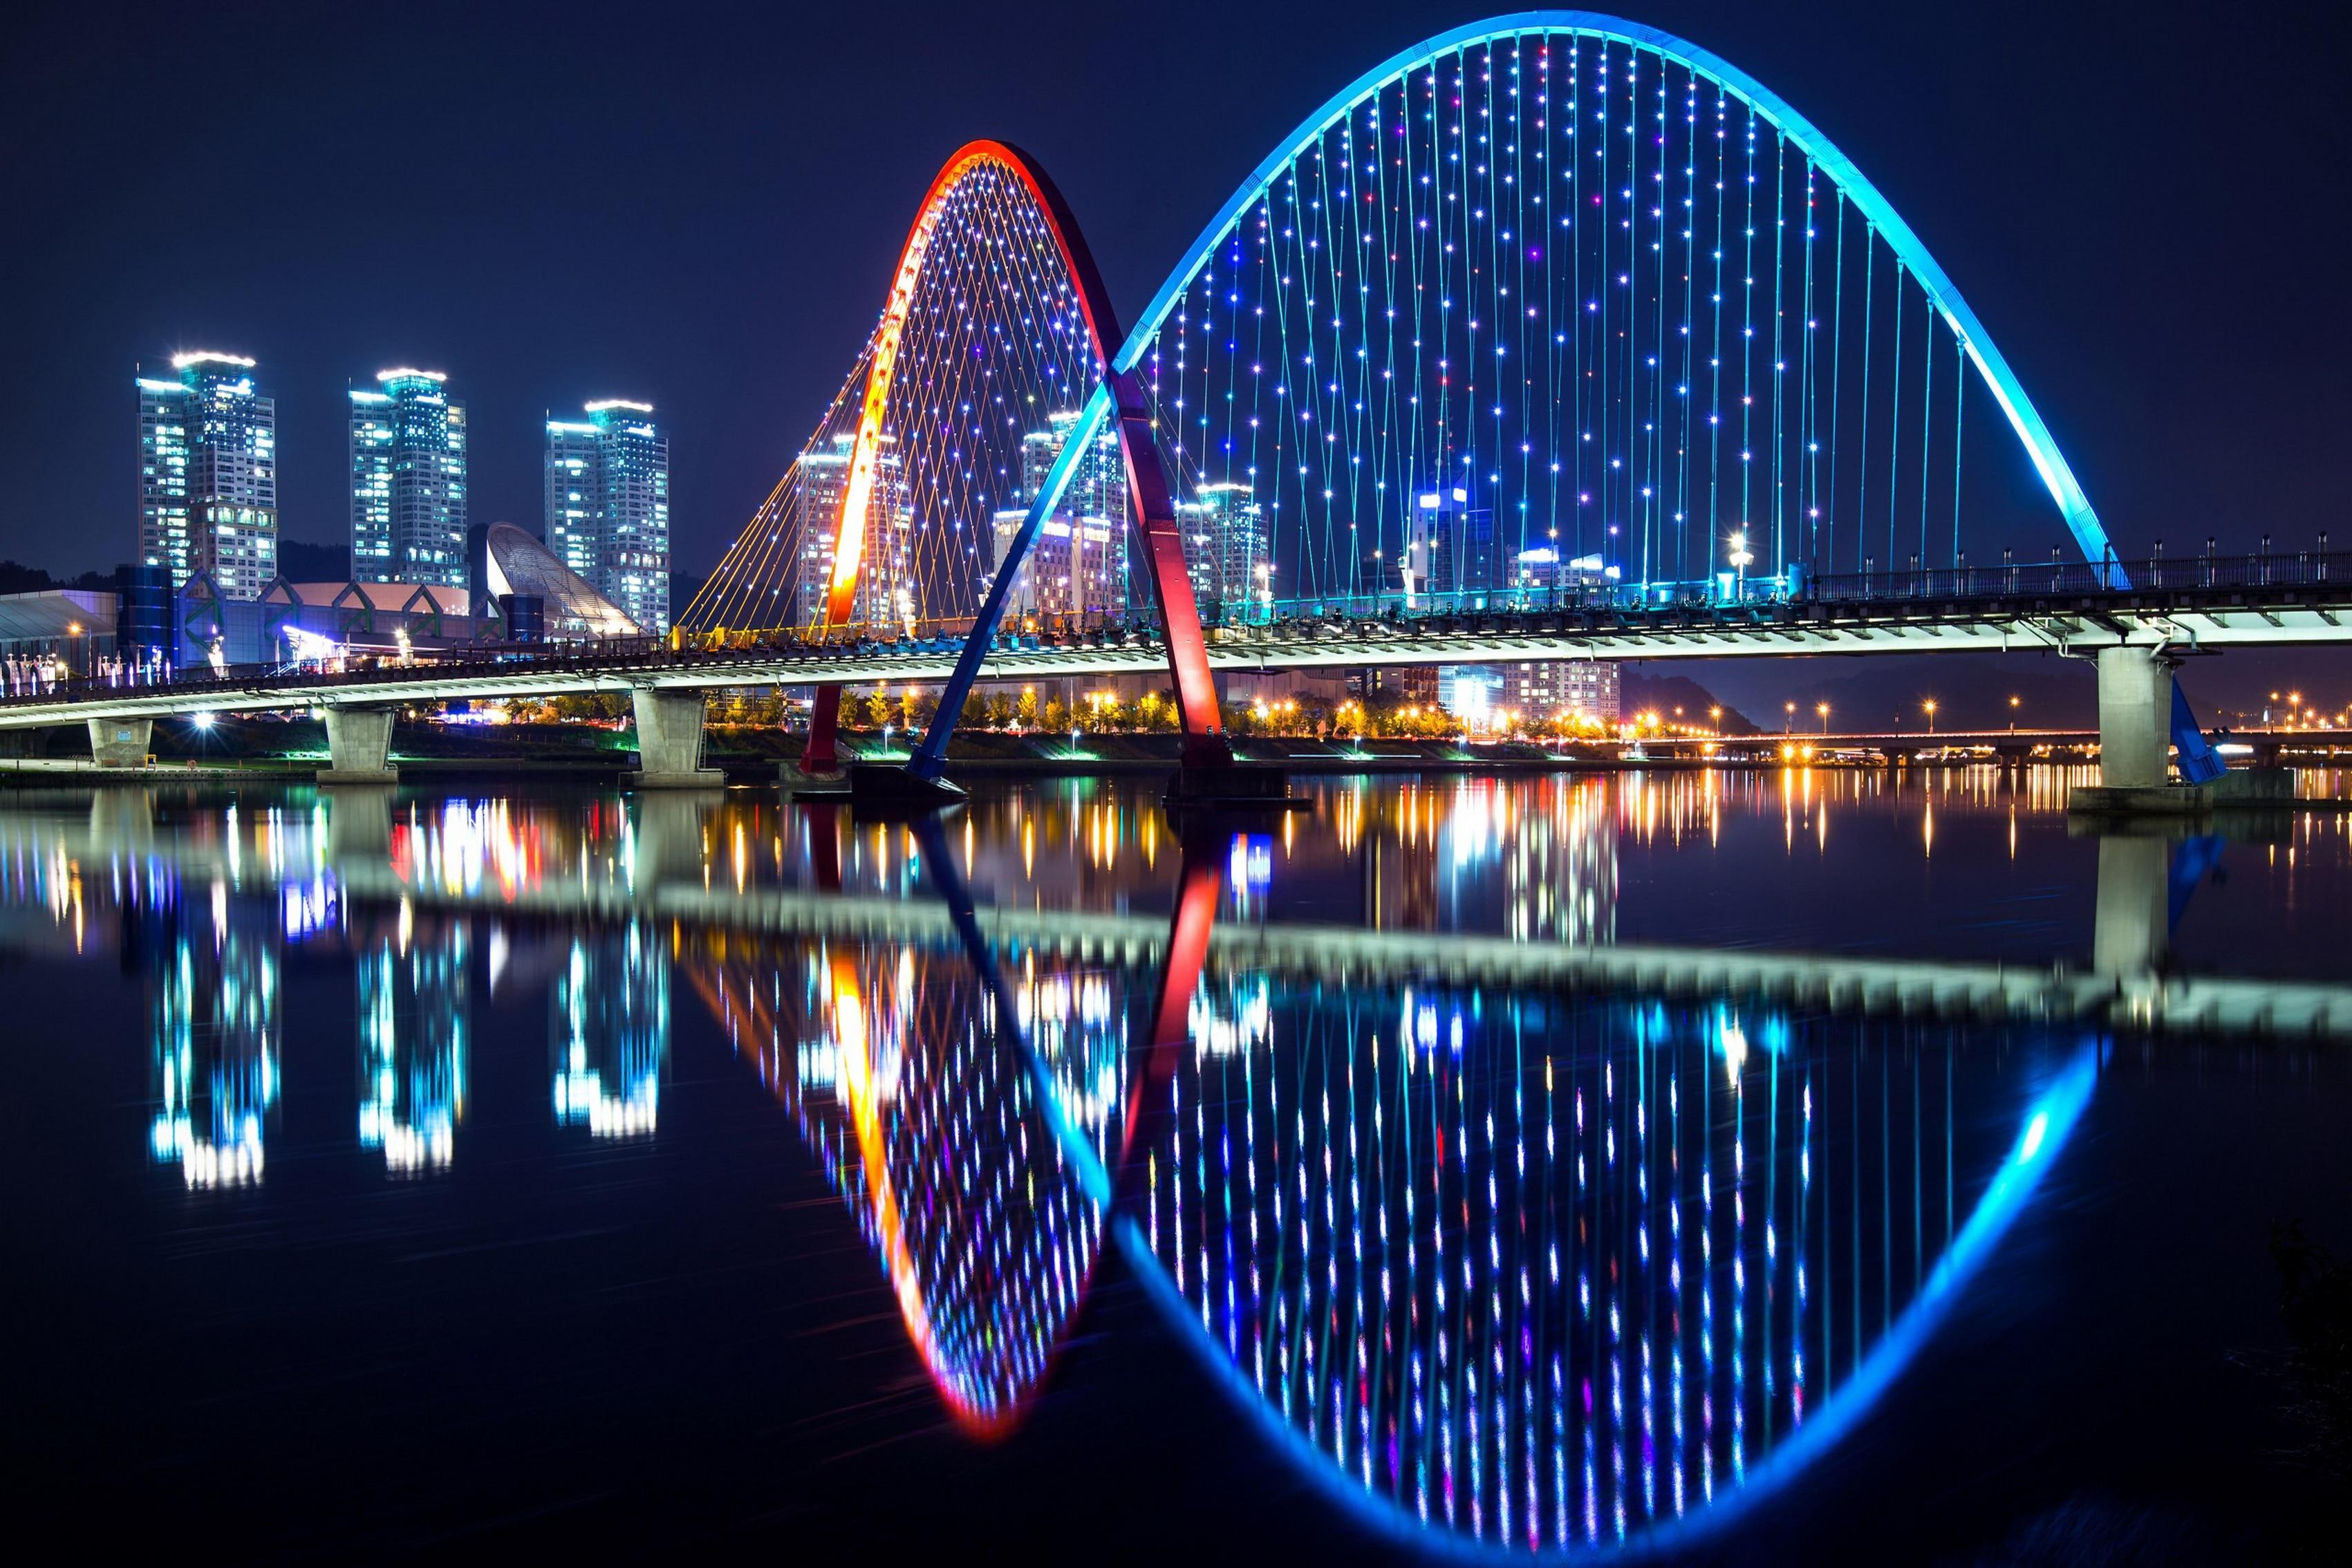 Home decoration South Korea Daejeon bridge river night lights home skyscrapers landscape Silk Fabric Poster Print 408FJ